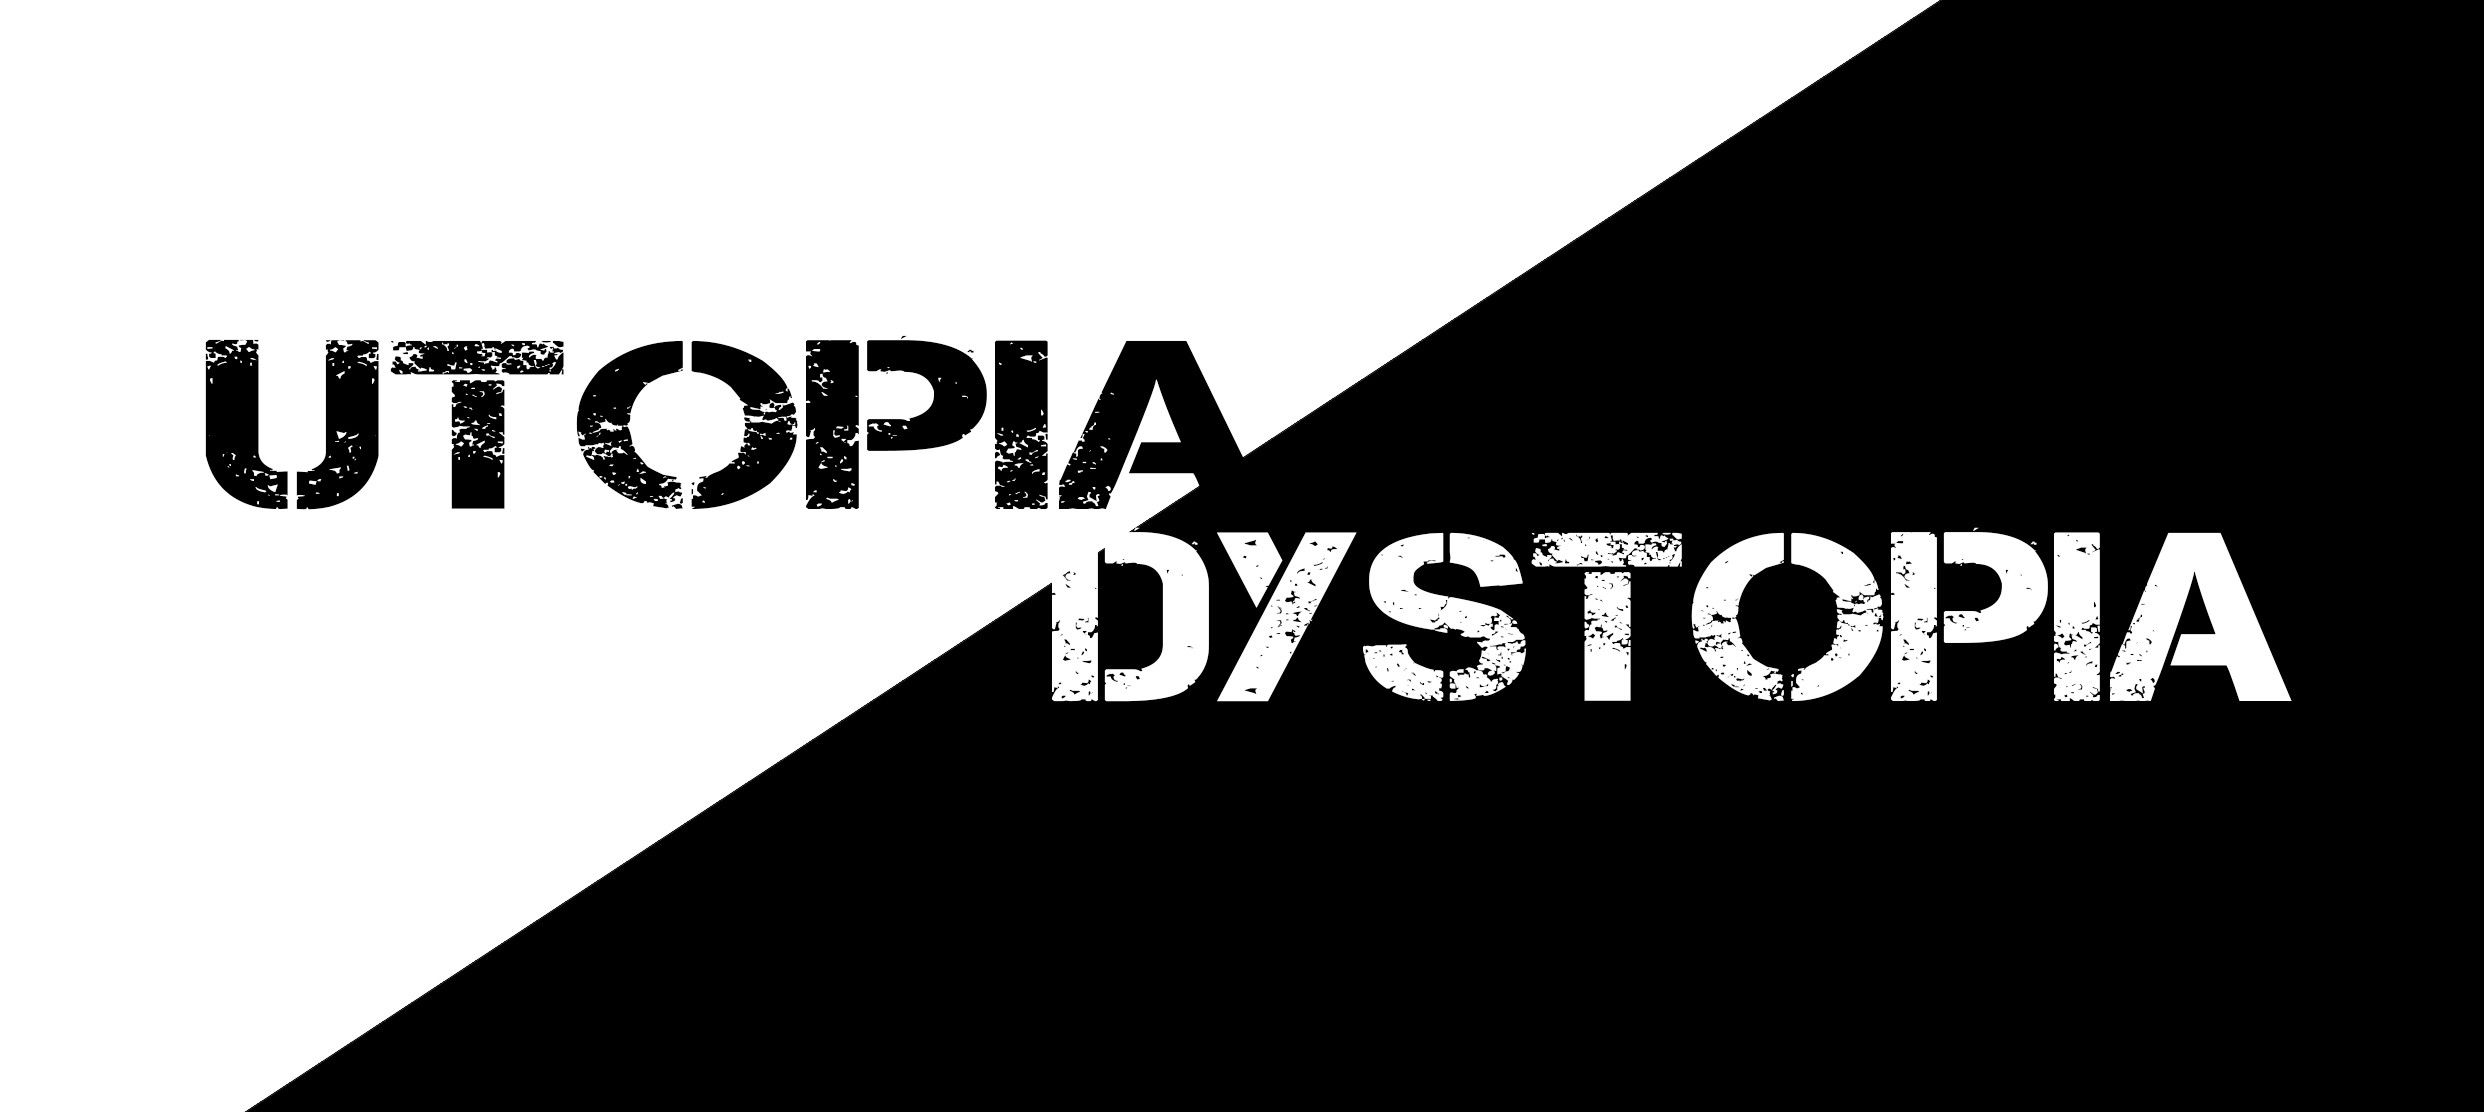 opposite utopia best ideas about more utopia classic books prentis  write about utopia vs dystopia utopia vs dystopia utopiadystopia